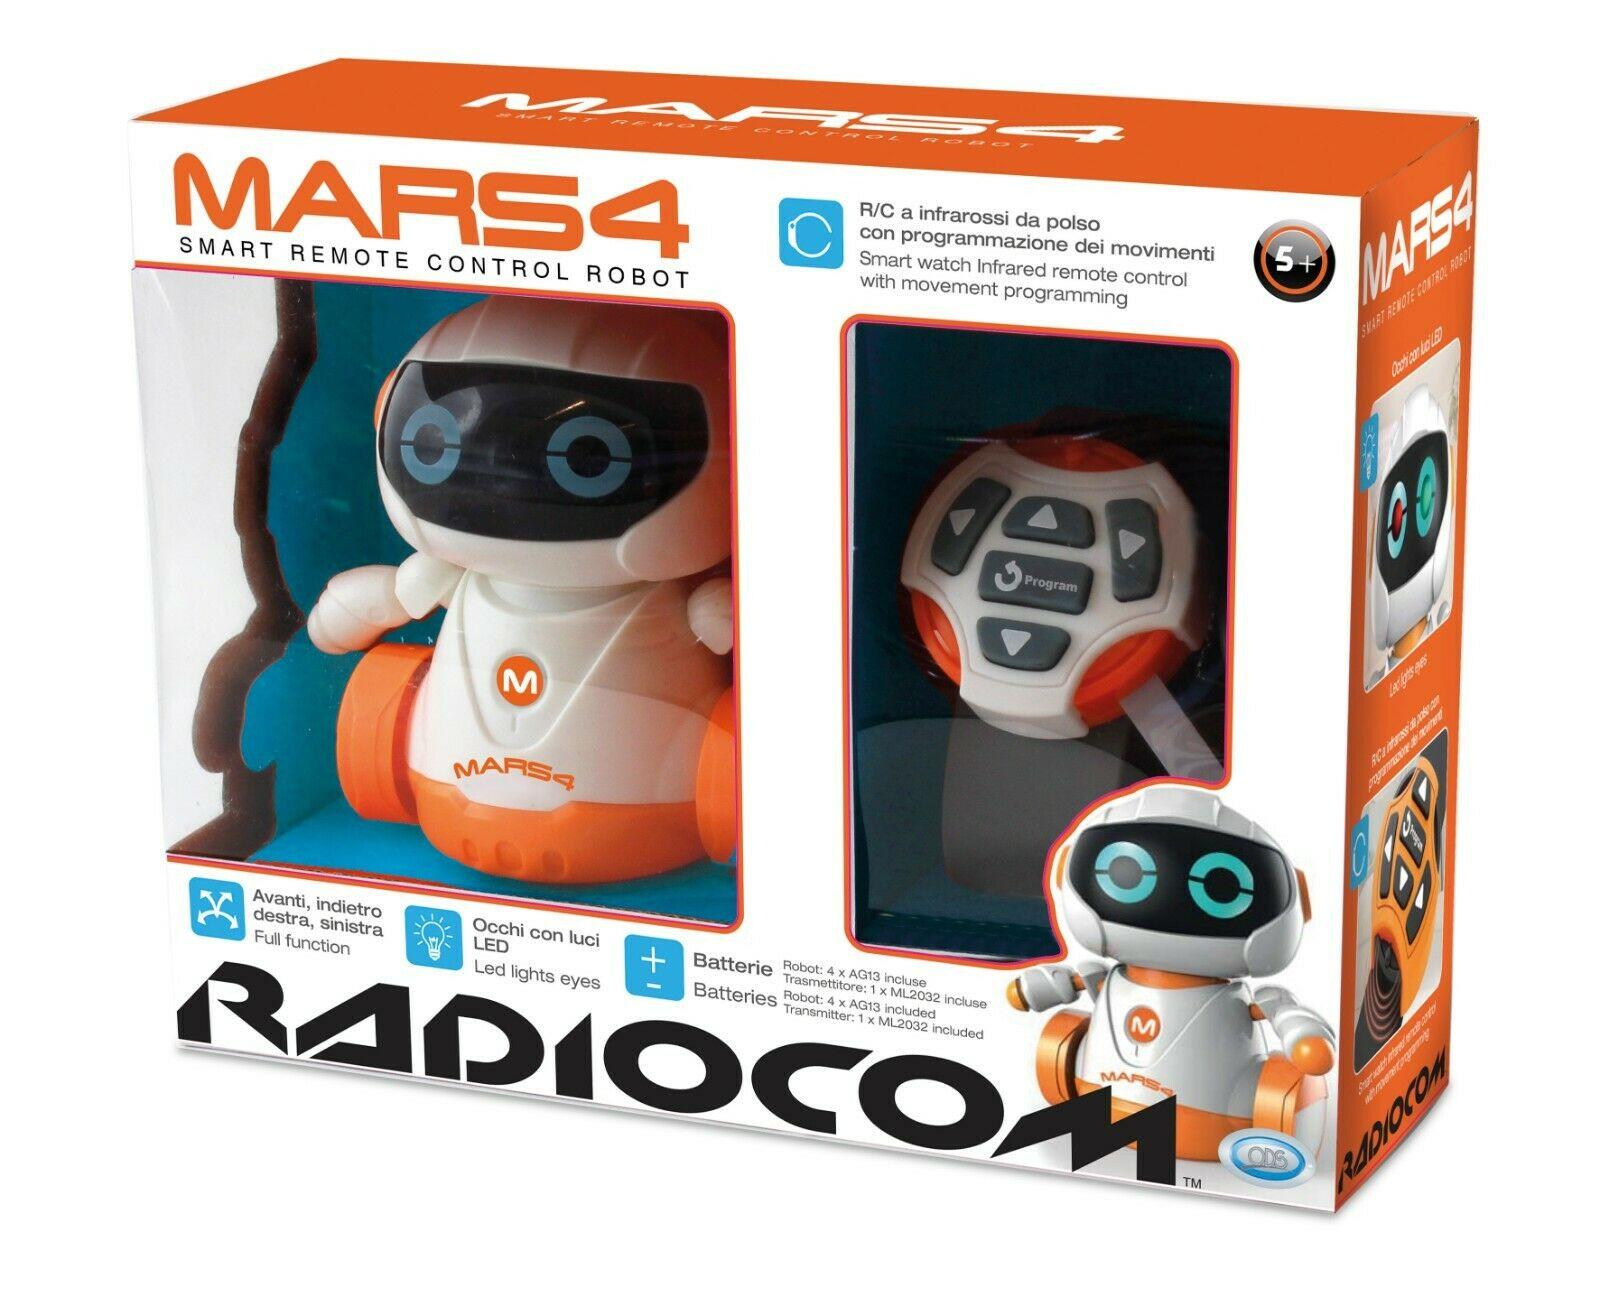 Robot Mars 4